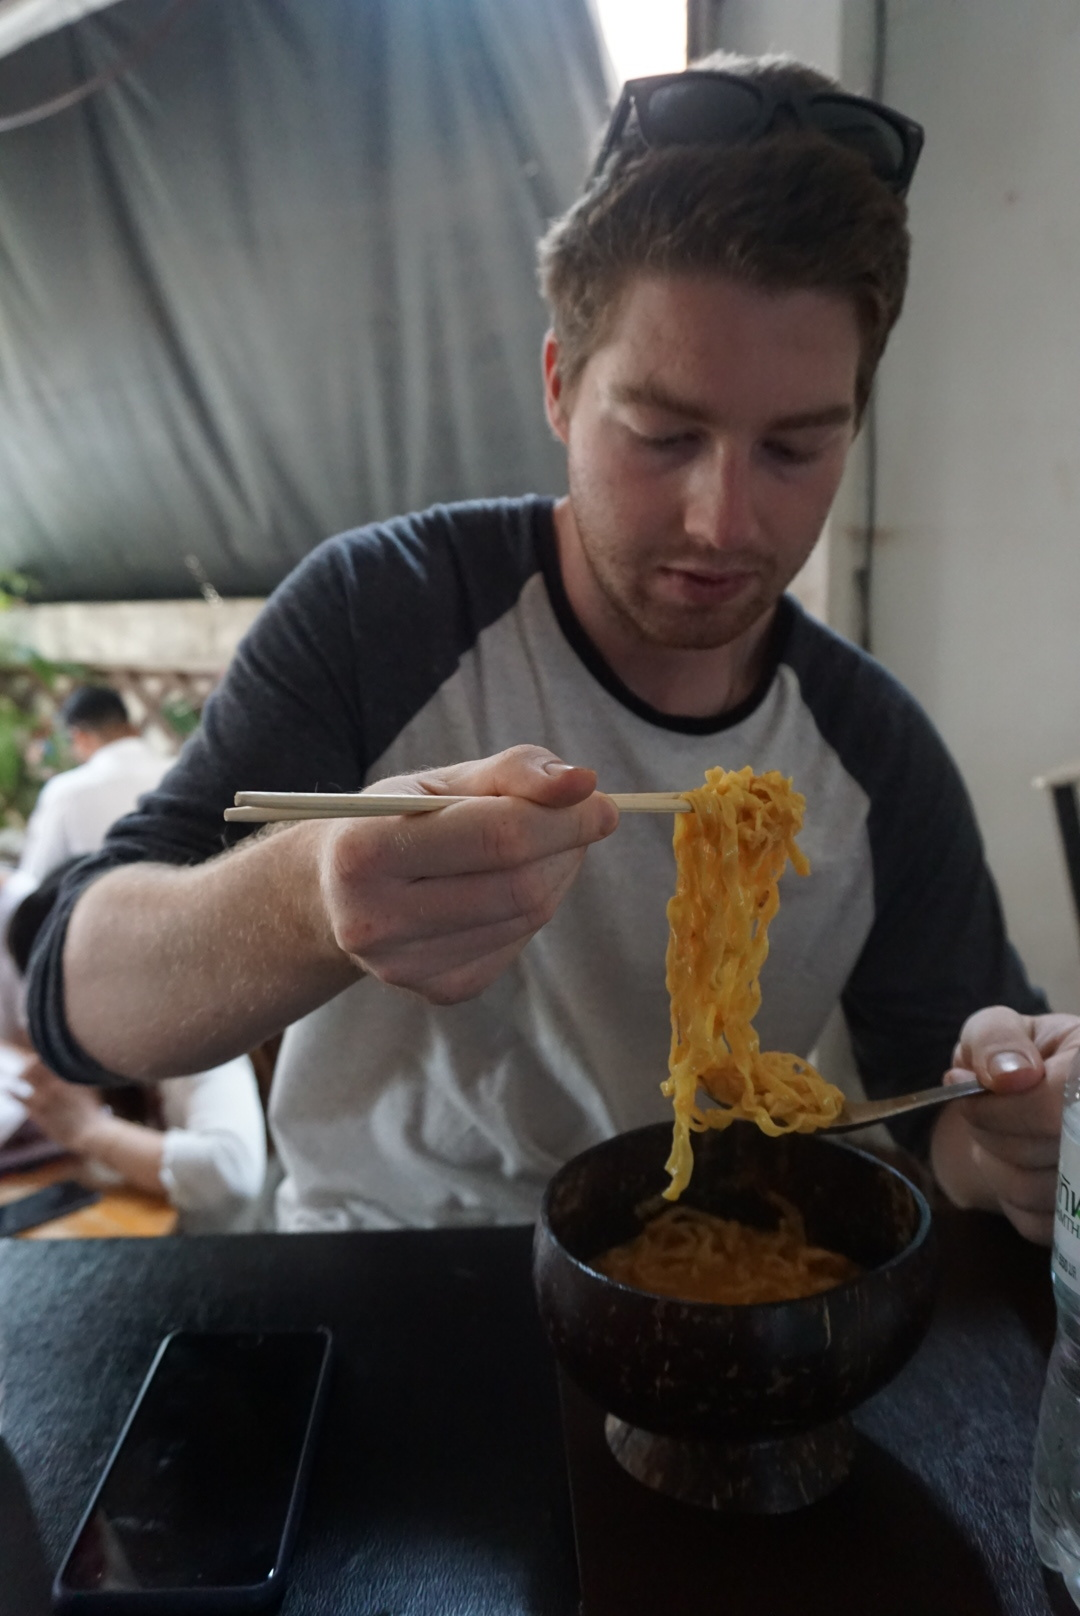 Greg loving the Khao Soi at Coconut Shell